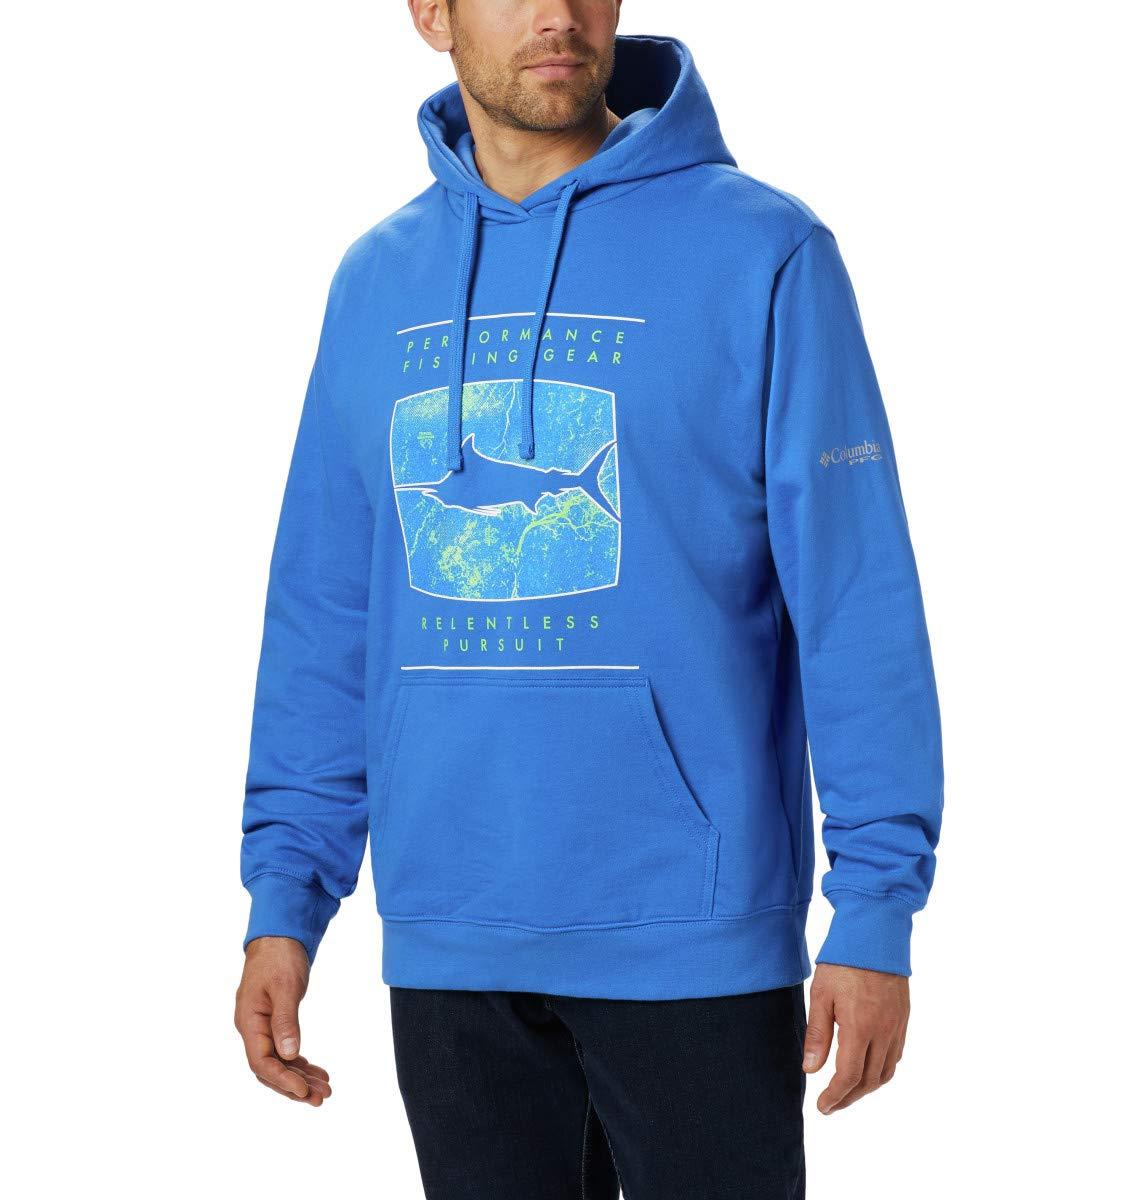 Columbia Men's PFG Triangle Seasonal Hoodie, Vivid Blue, Marlin Realtree Mako Print, Large by Columbia